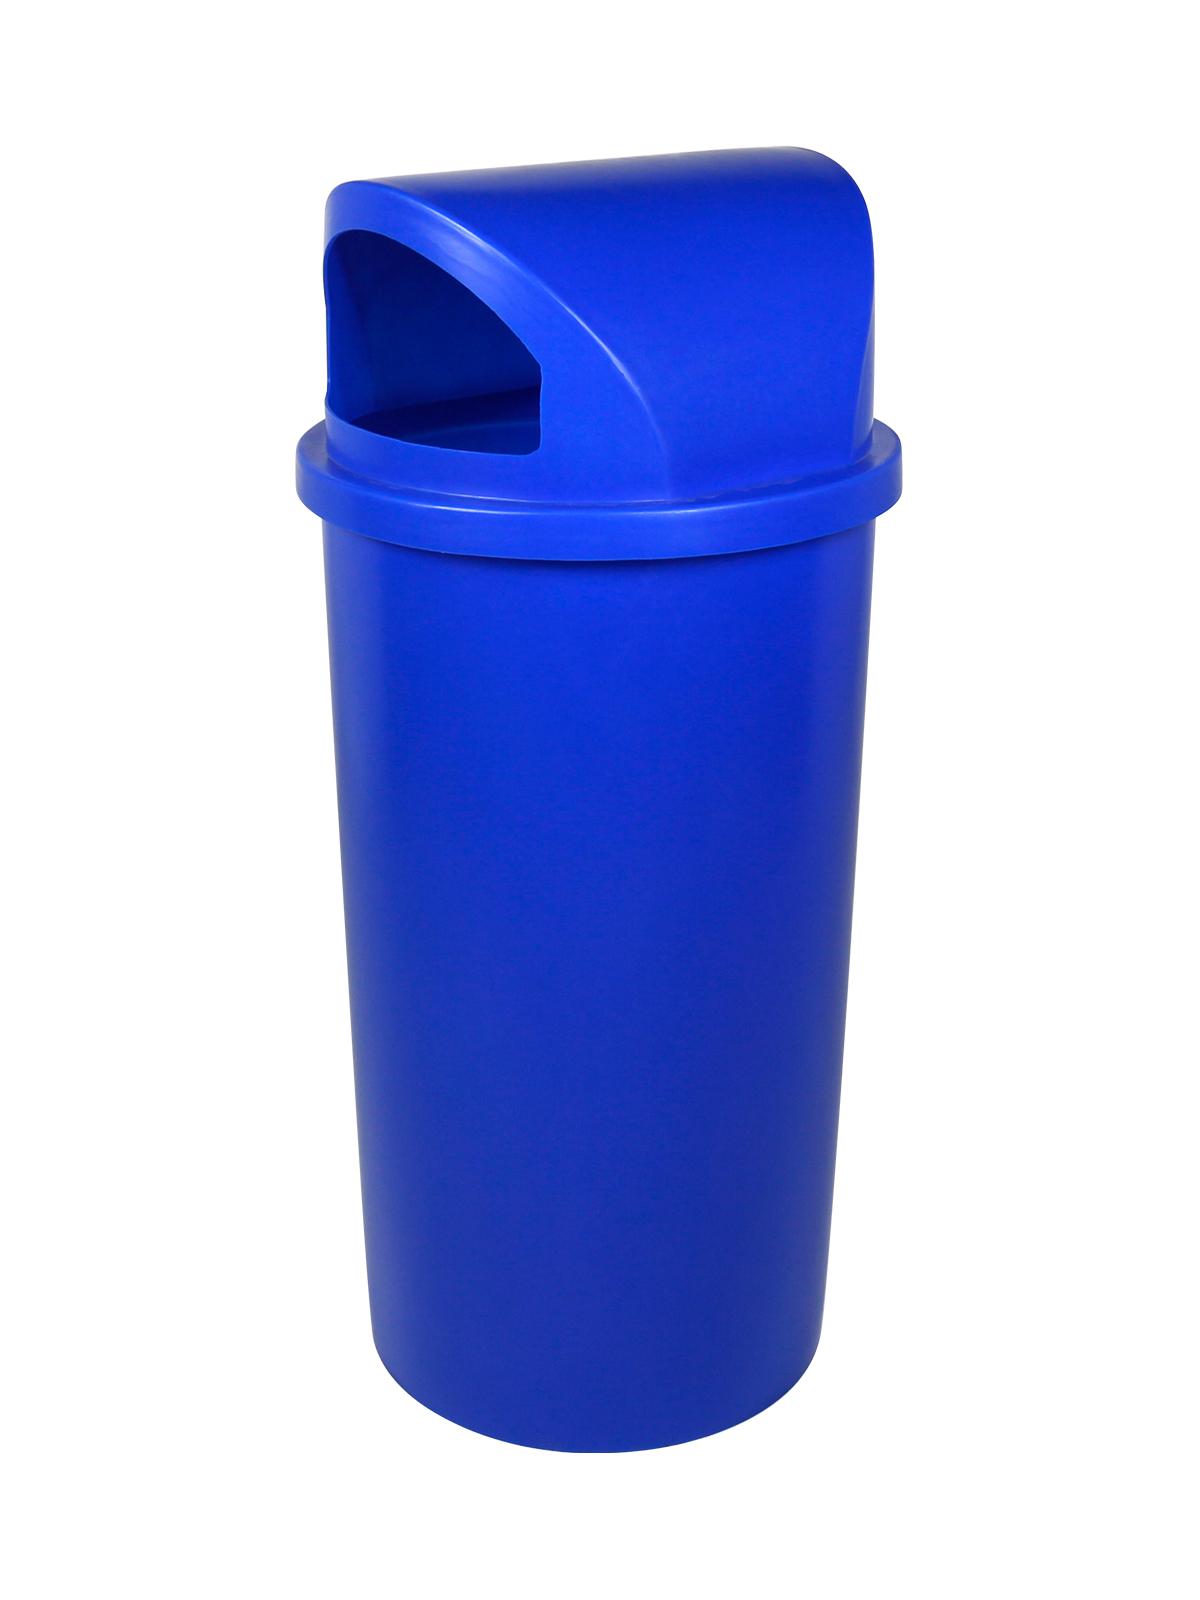 ARIZONA - Unit - Full - Blue